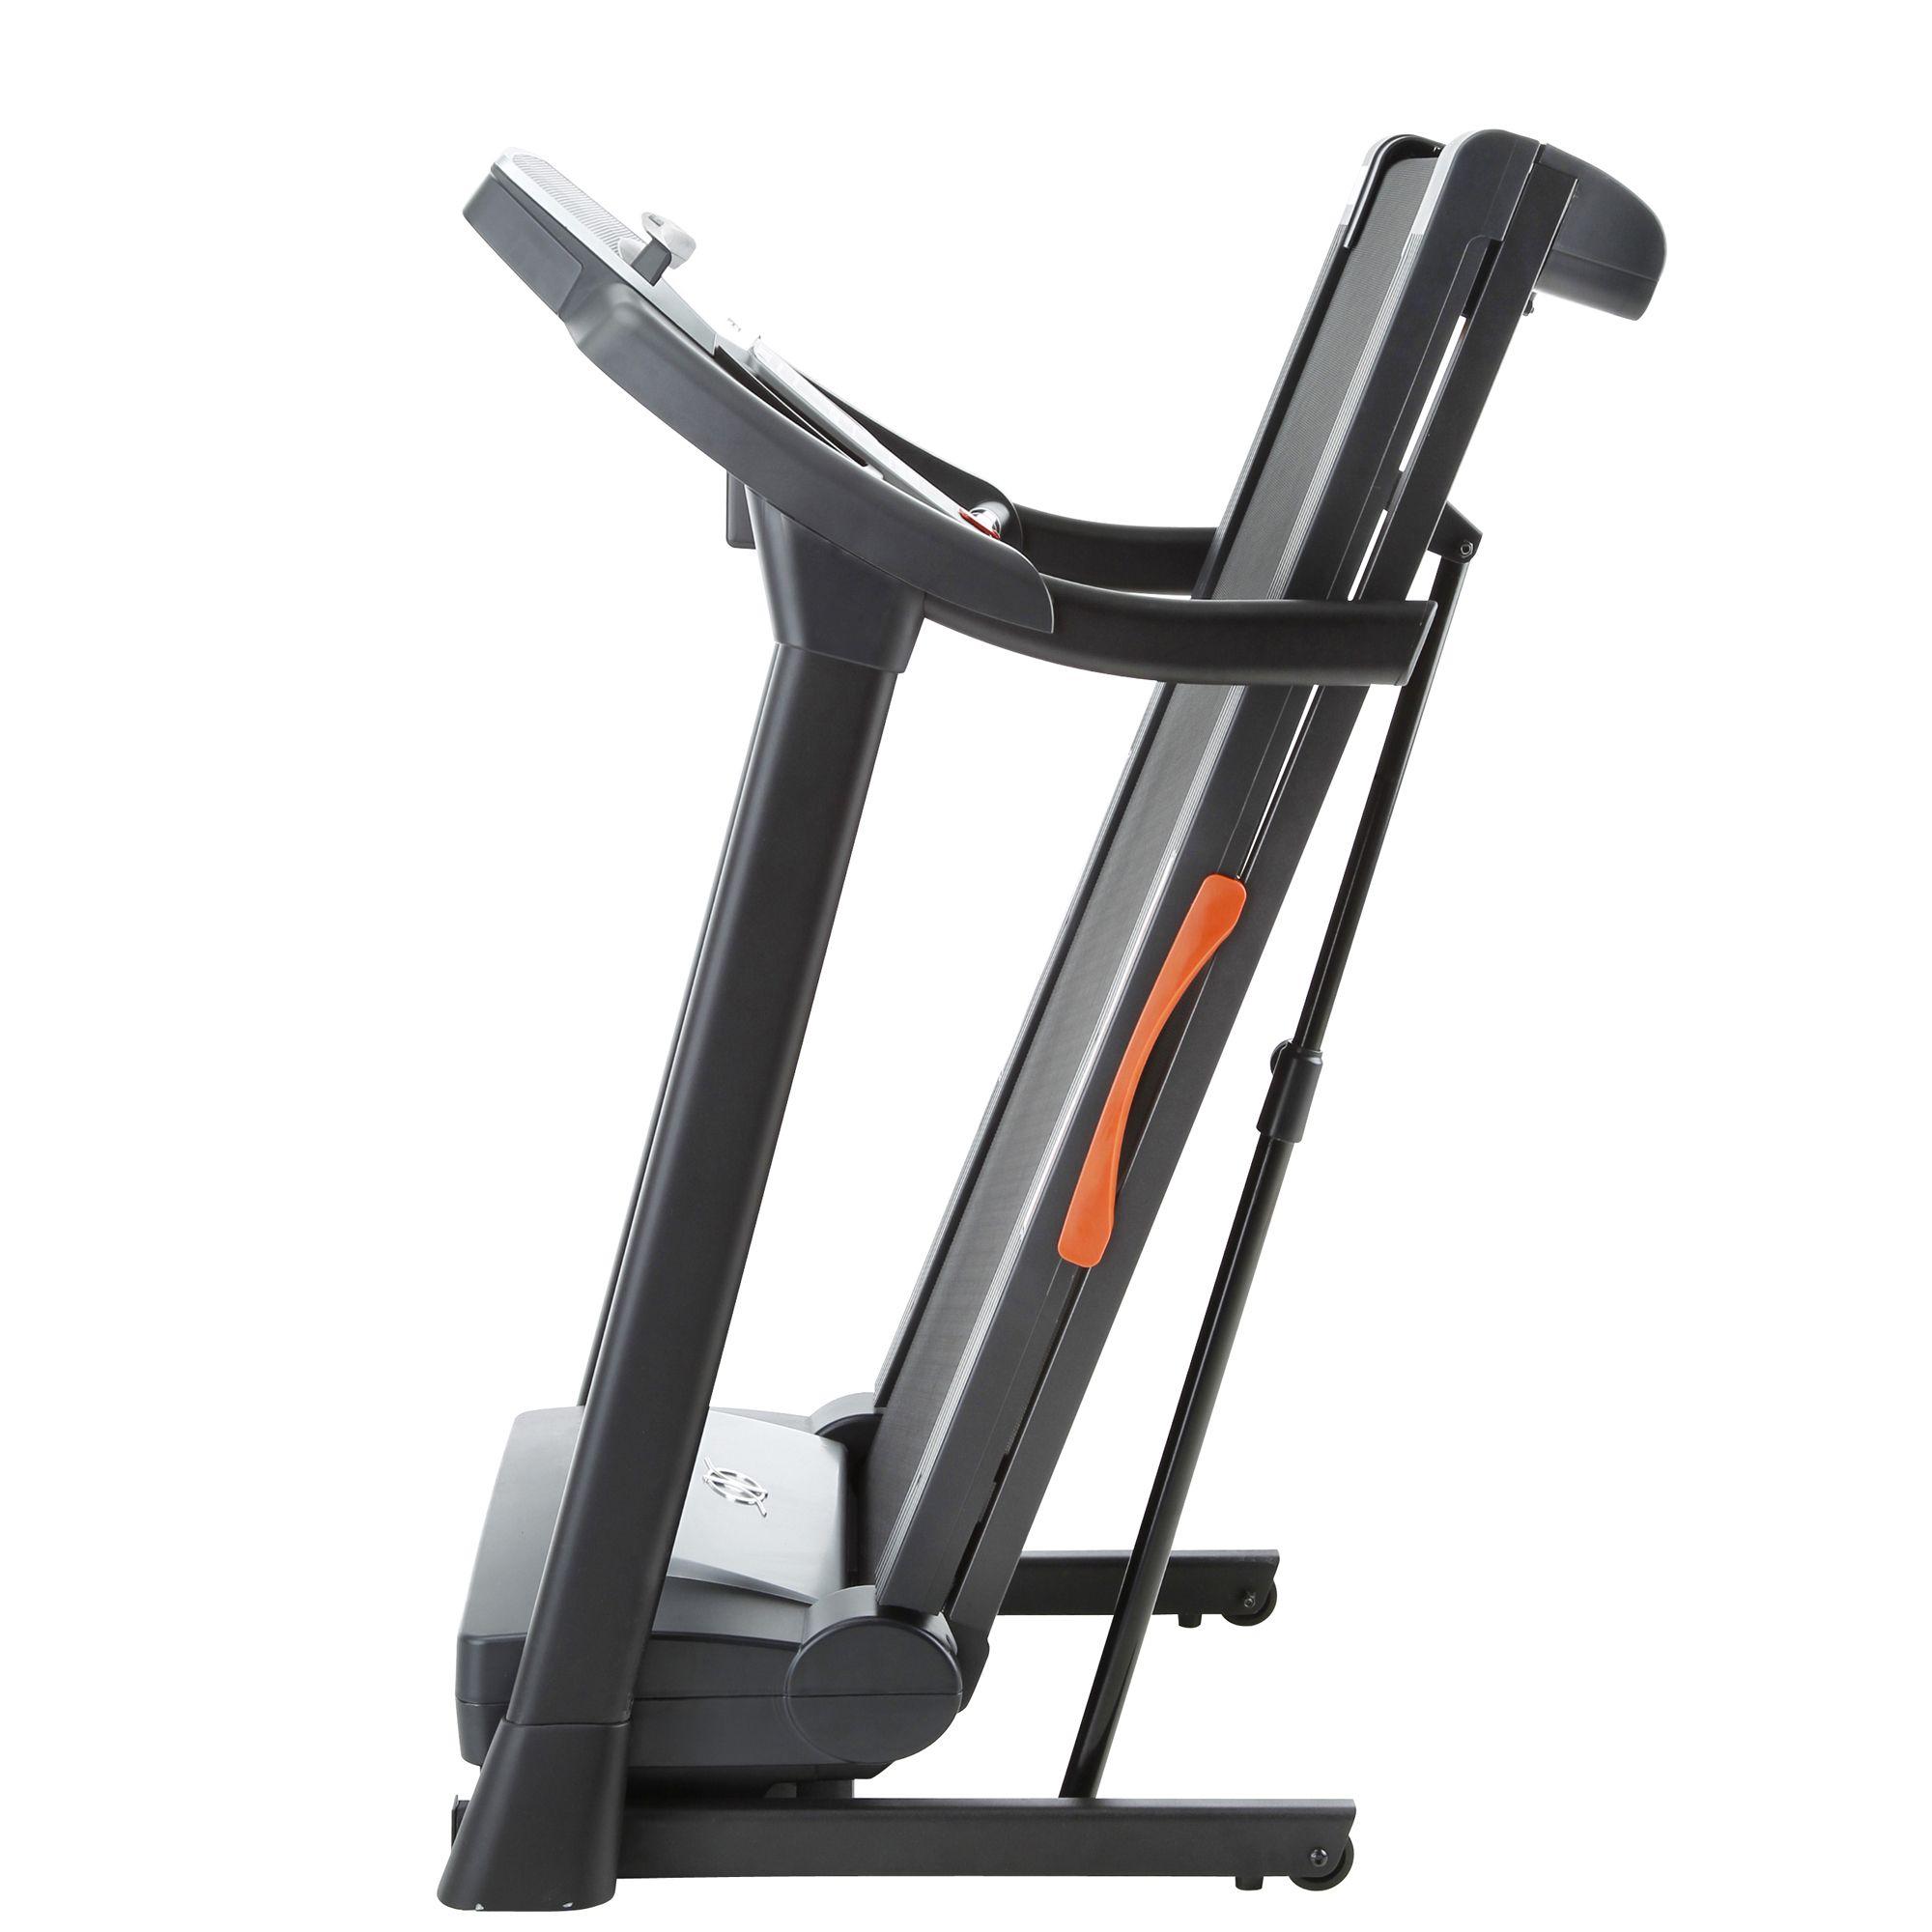 NordicTrack T5.3 Treadmill